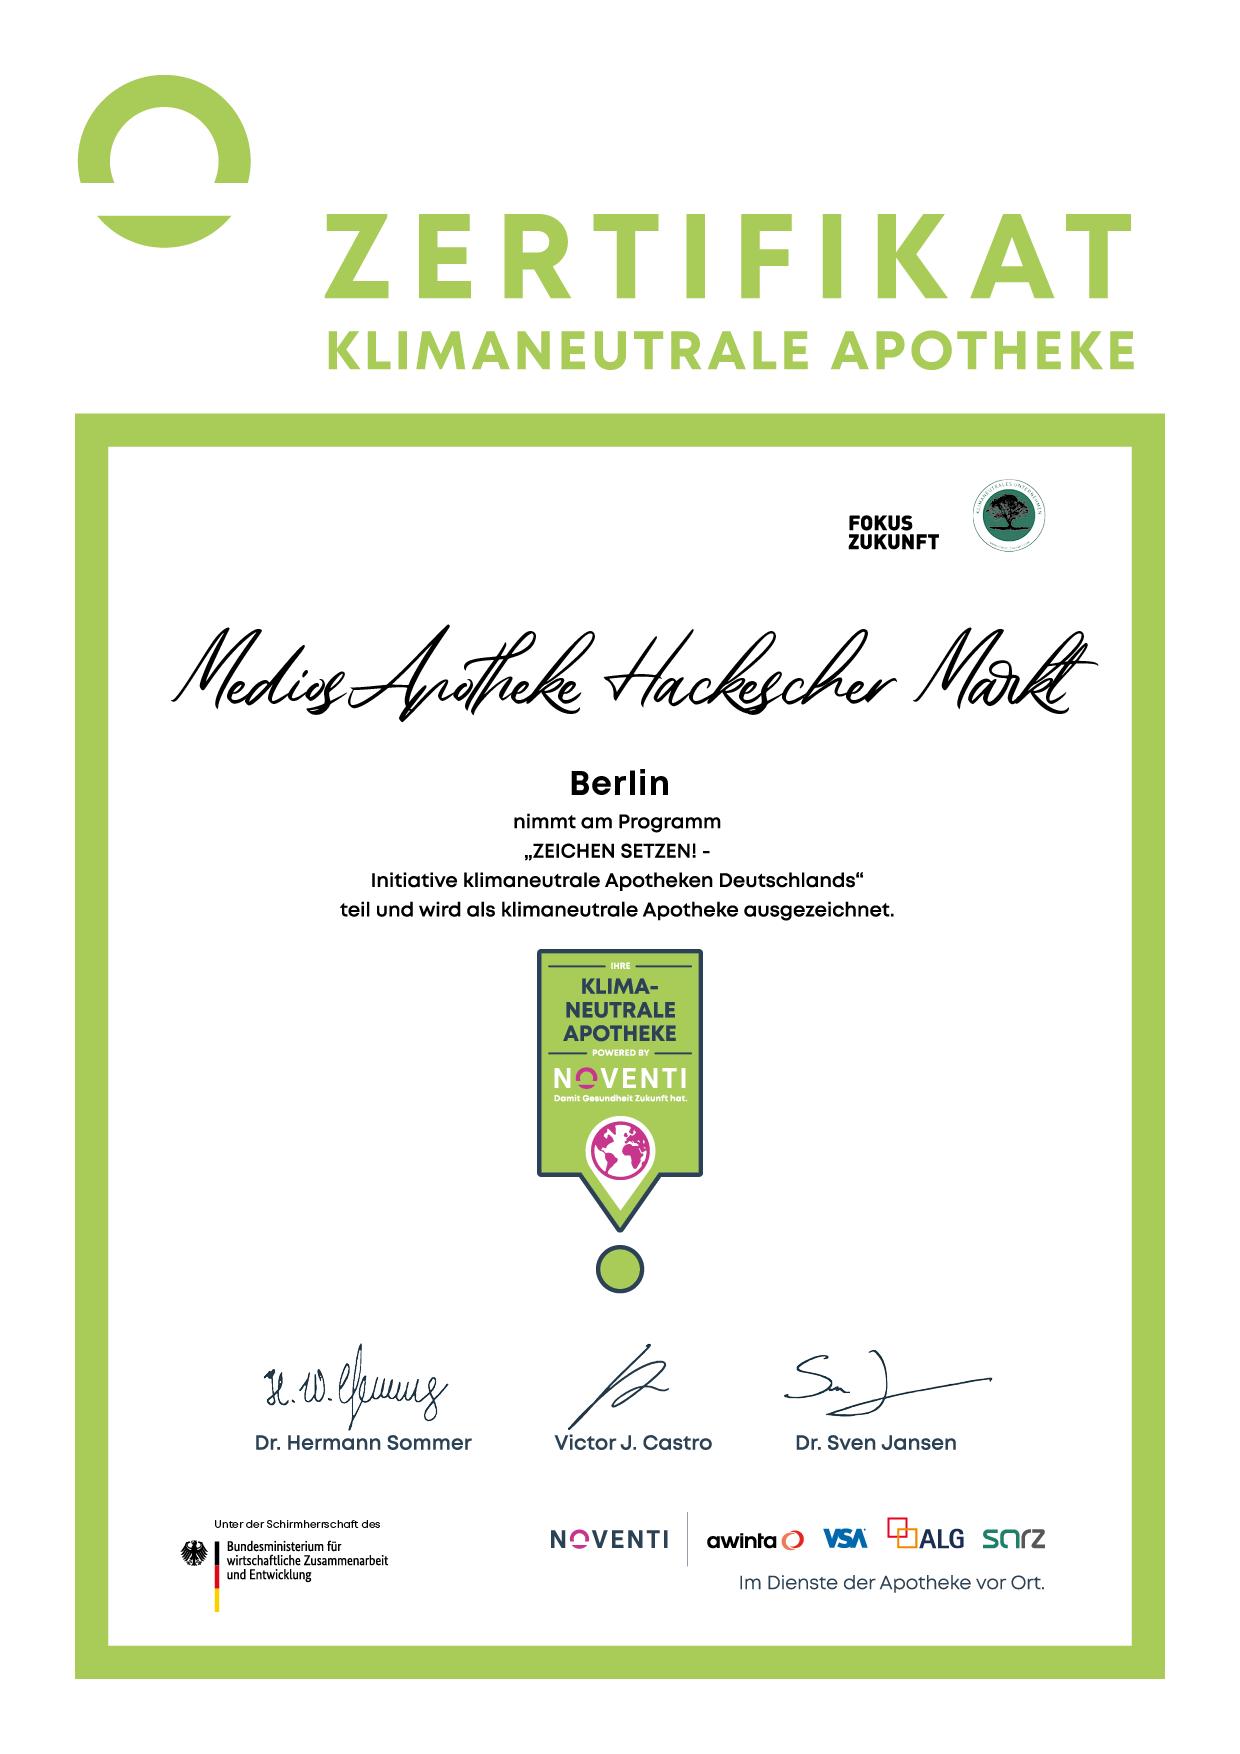 MediosApotheke Noventi Auszeichnung